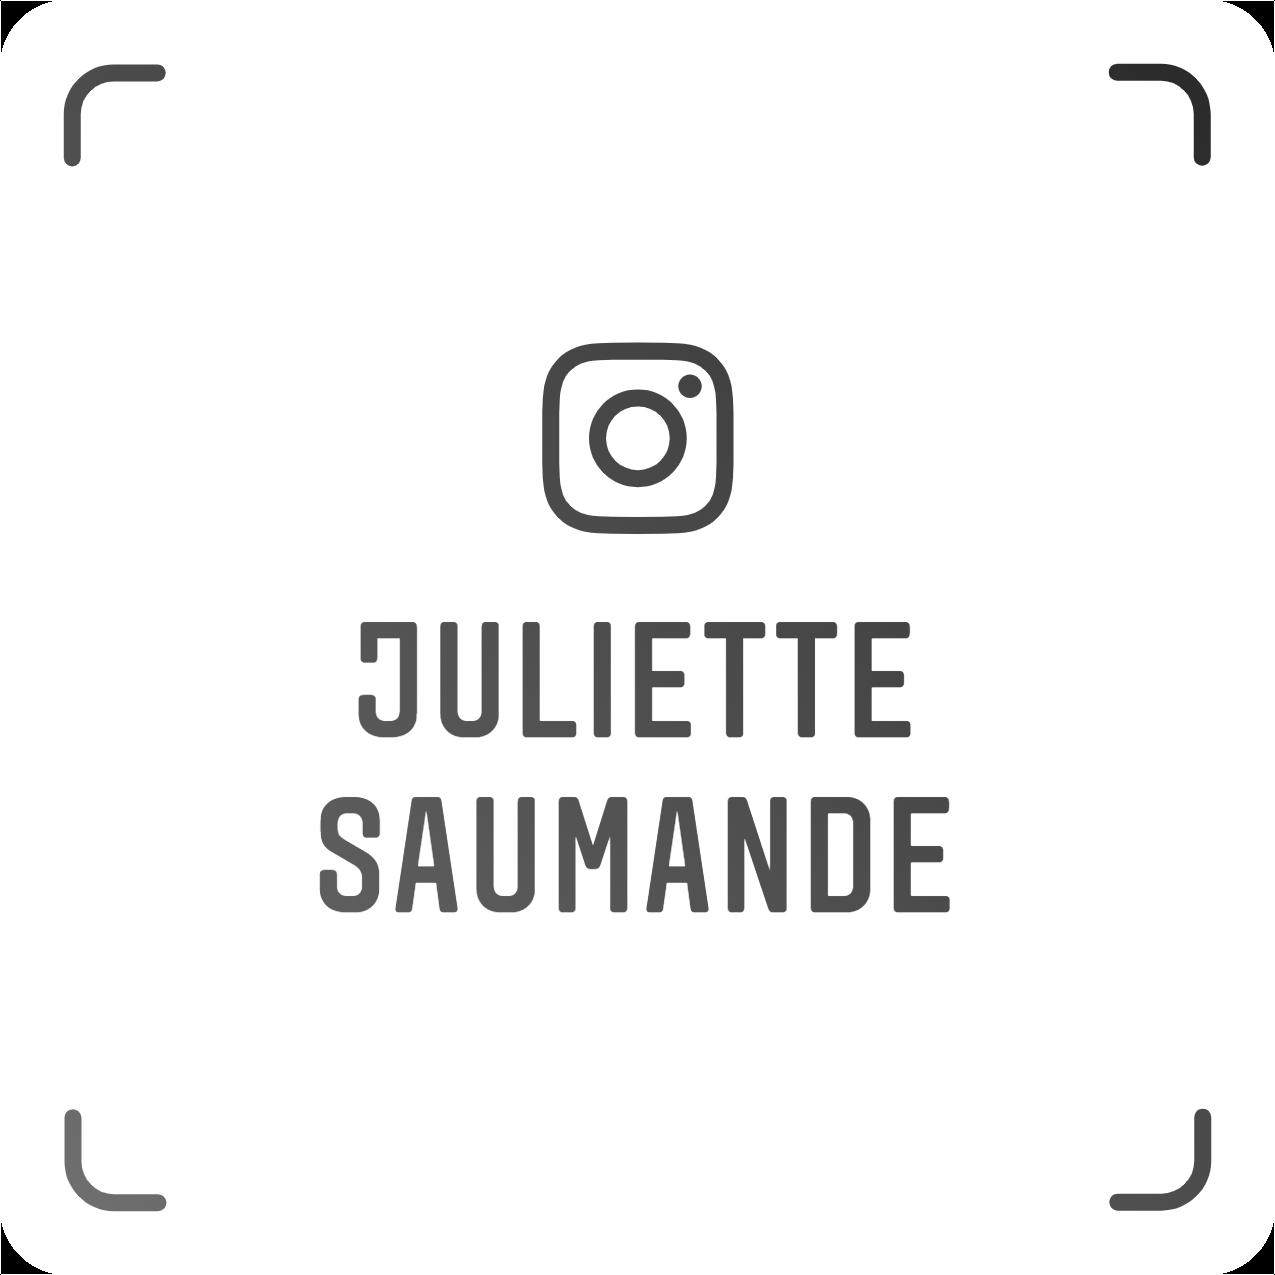 Over on Instagram